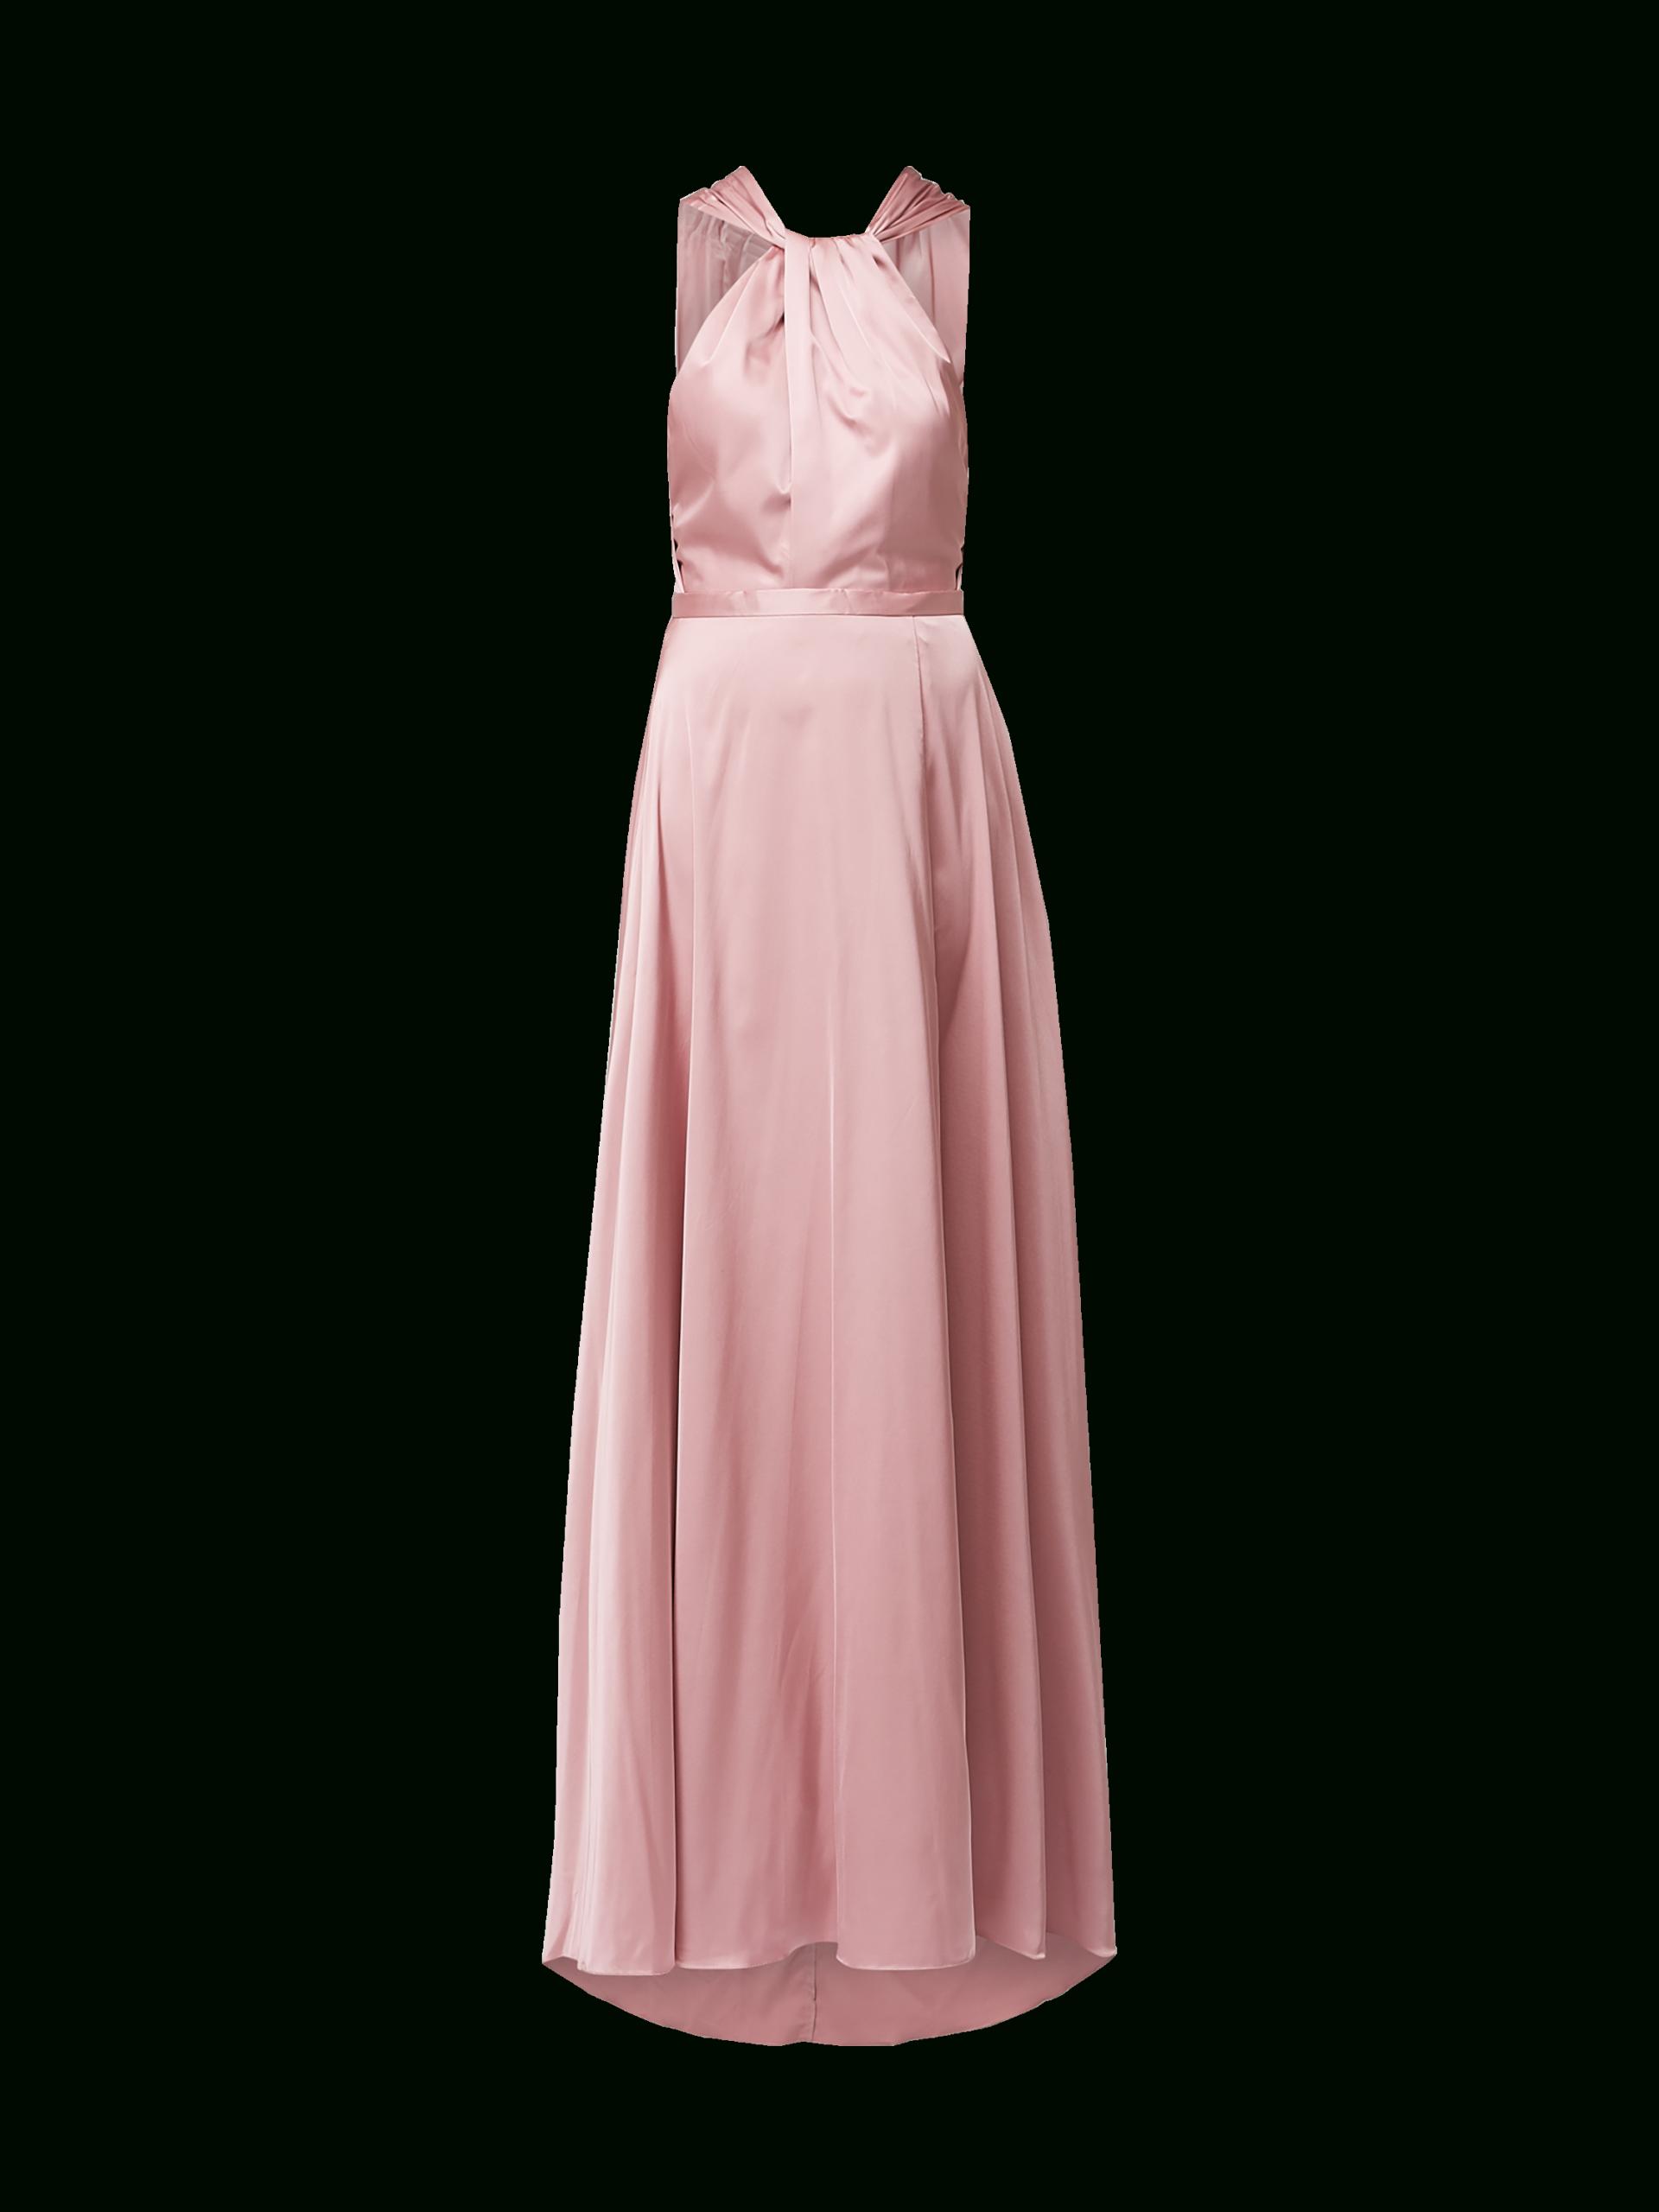 17 Elegant Unique Abendkleid Aus Satin für 201913 Schön Unique Abendkleid Aus Satin Design